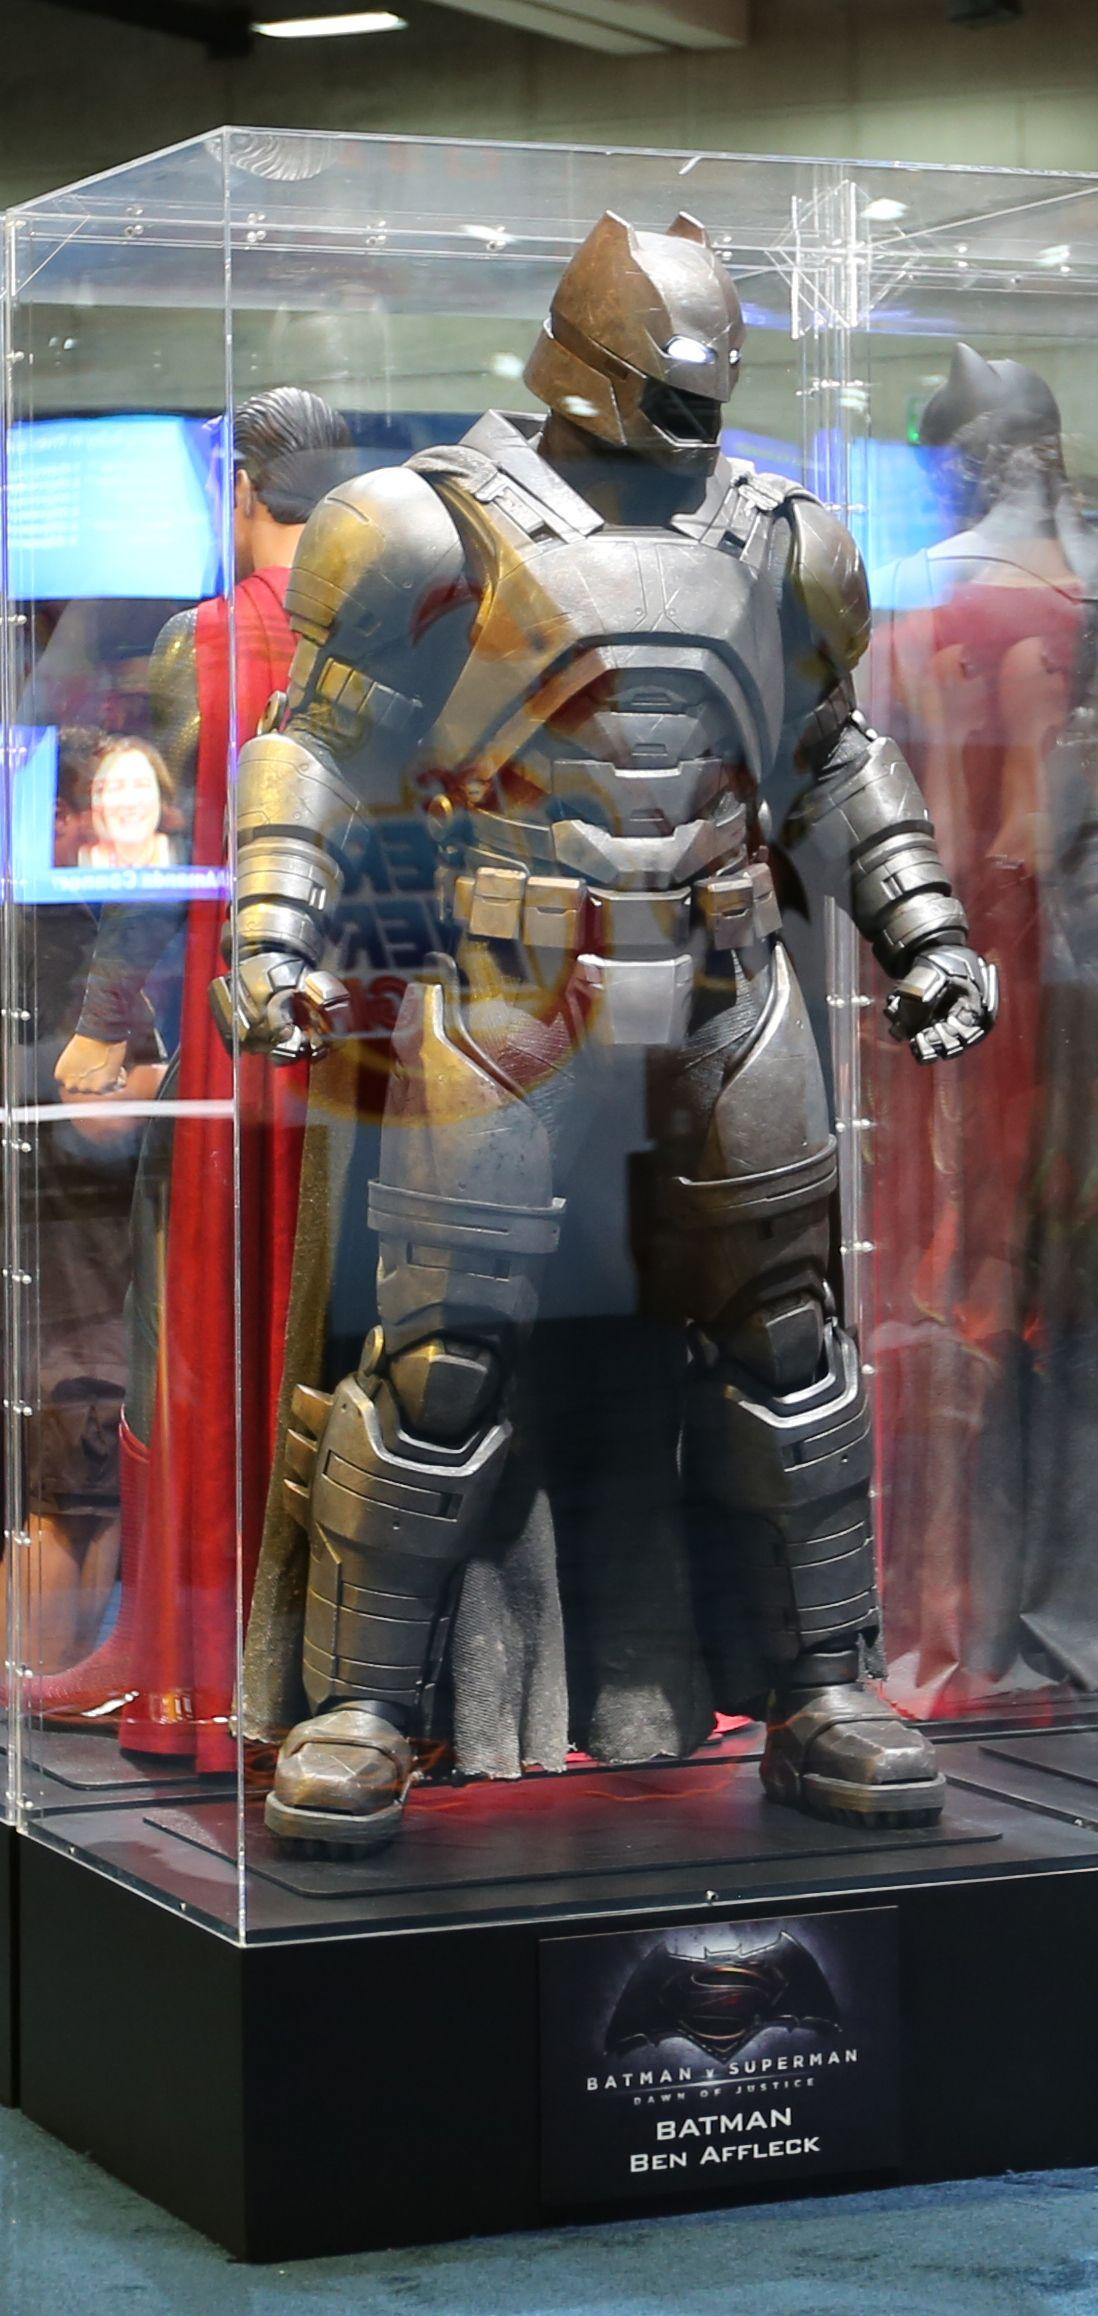 Batman V Superman Armor Comic Con Image